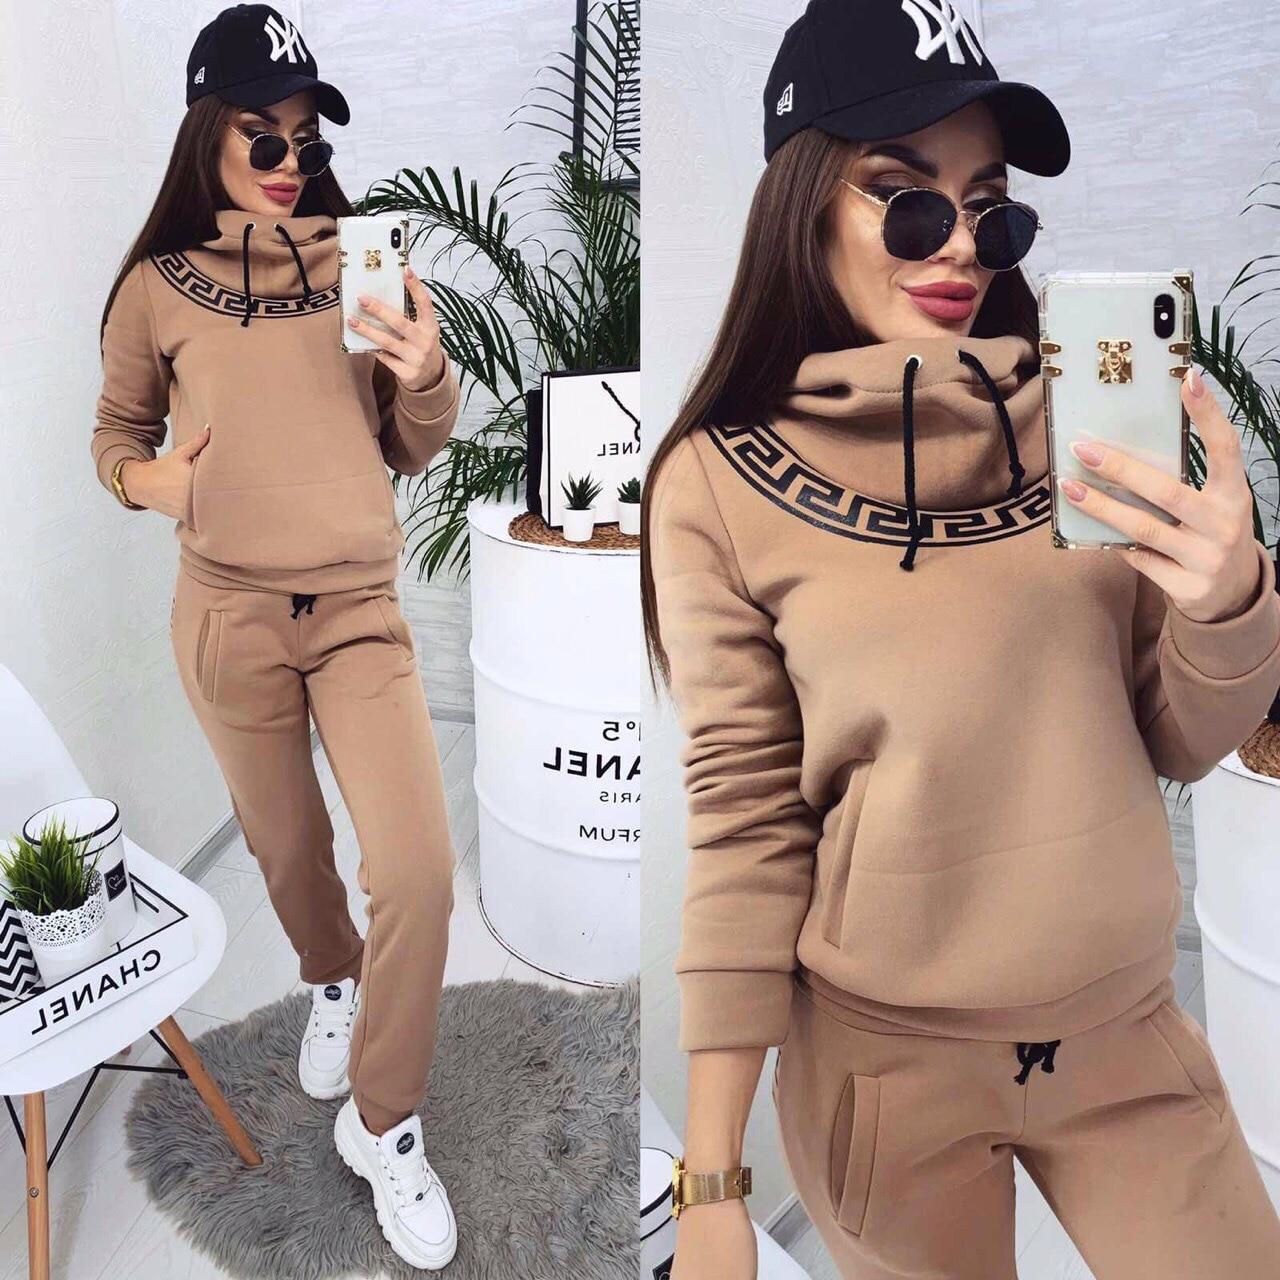 >Velvet Tracksuits Women Two Piece <font><b>Outfits</b></font> Causal Suit Women Fashion Sports Leisure Hooded Sweatshirt Pants <font><b>Set</b></font> Suit Two Piece